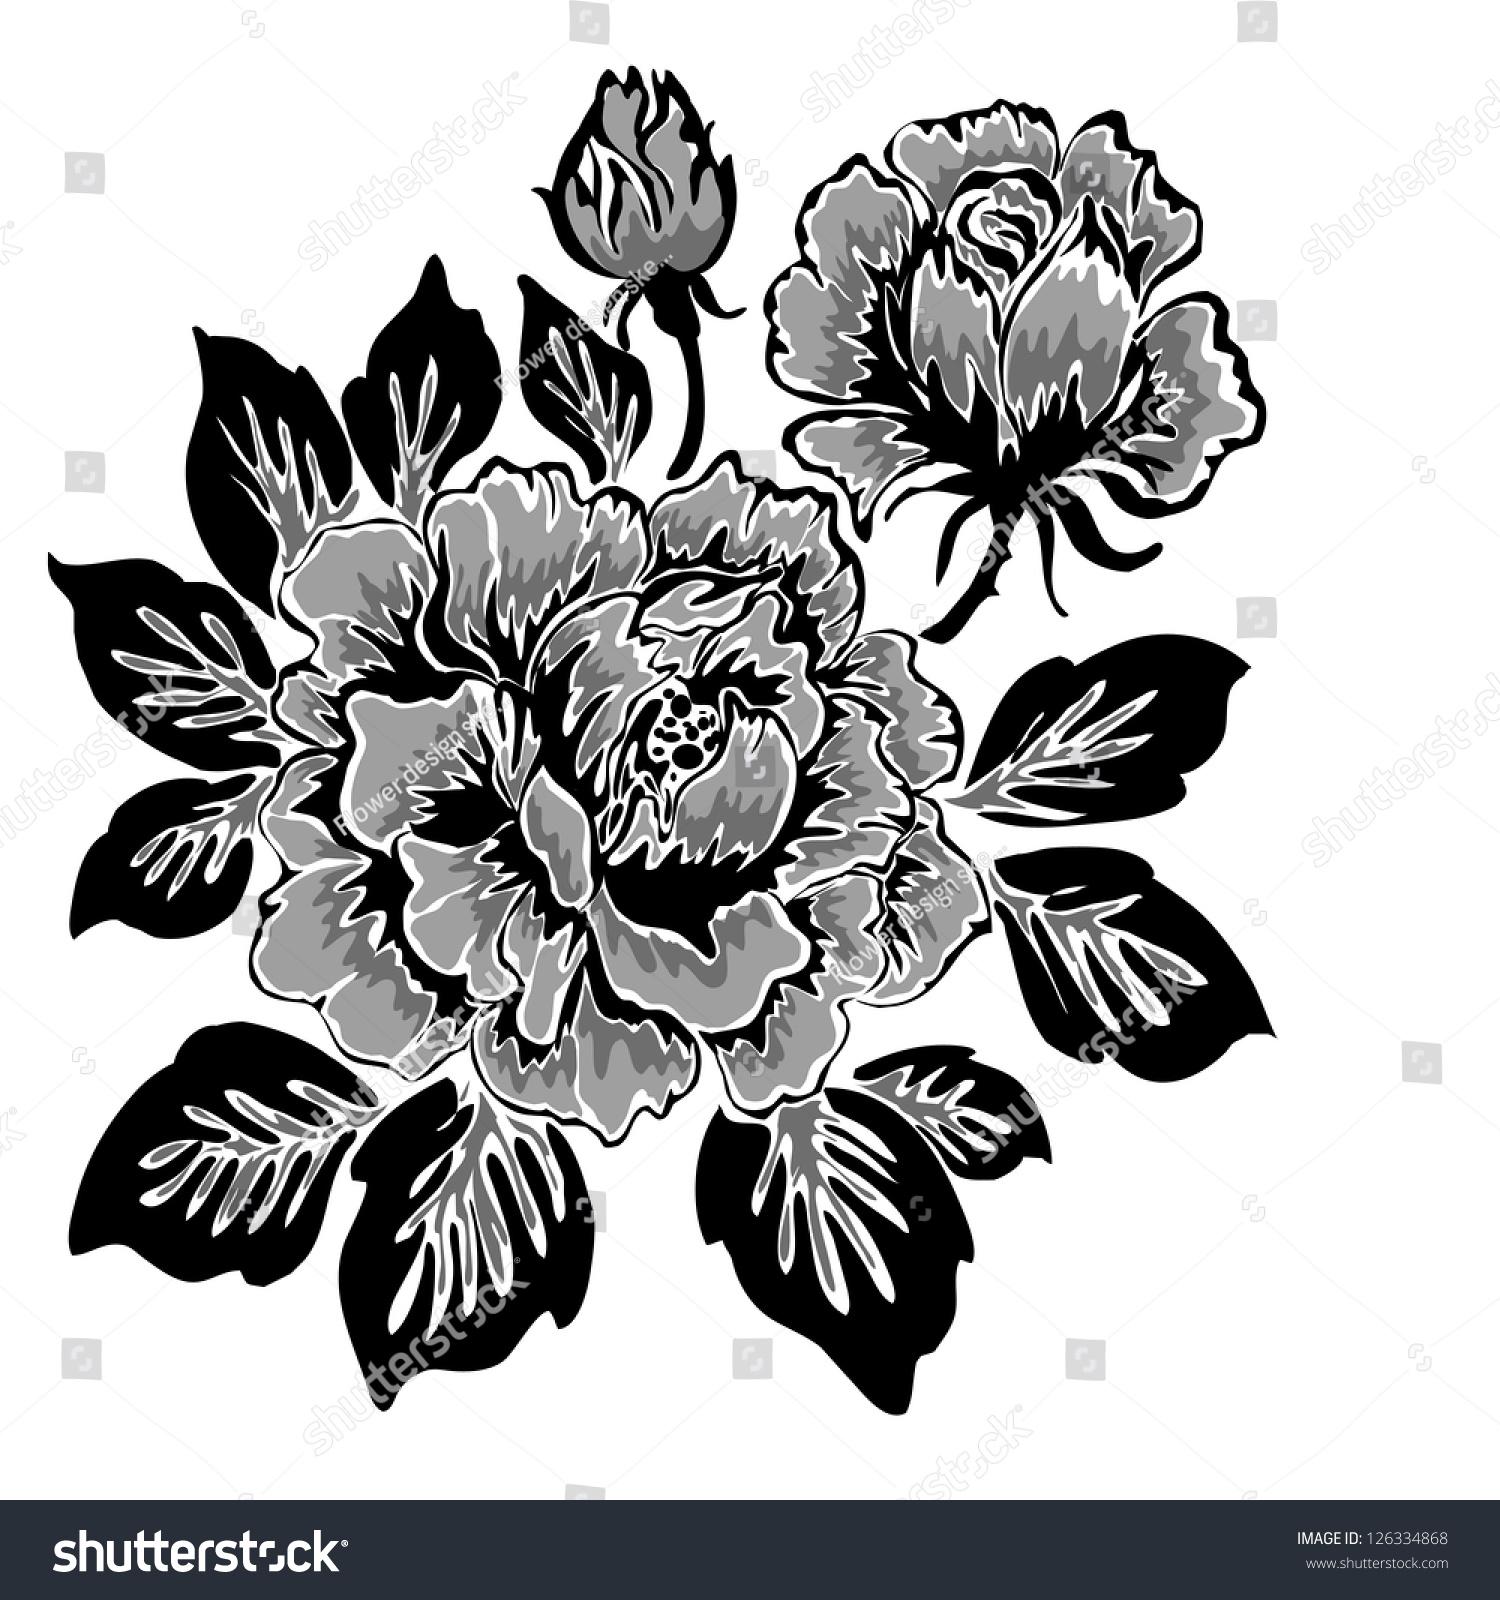 Peony flower isolated on white stock vector 368014568 shutterstock - Rose Pattern